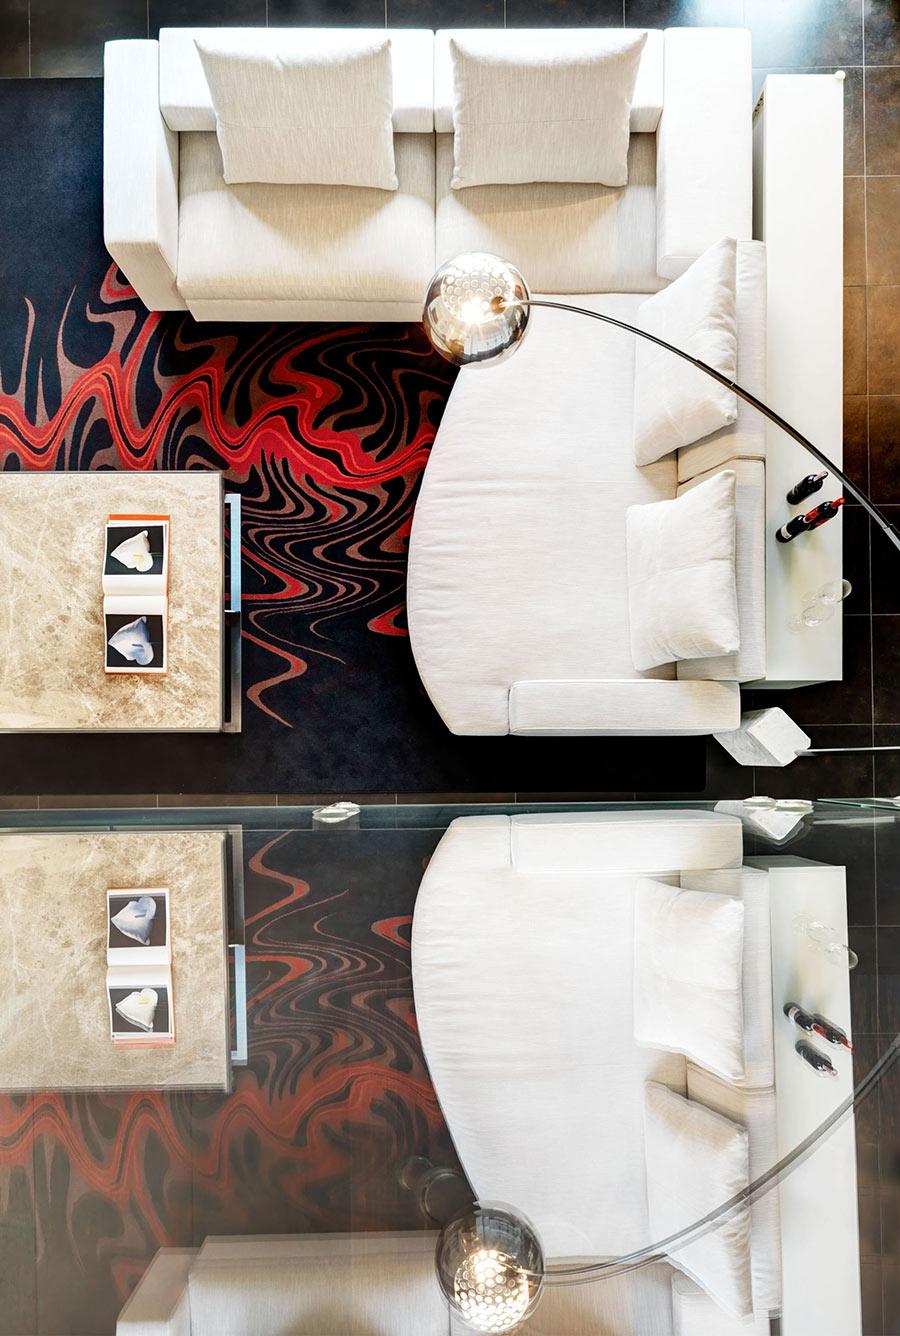 Grey Sofas, Rug, Lighting, Coffee Table, Villa on Lake Como by Studio Marco Piva